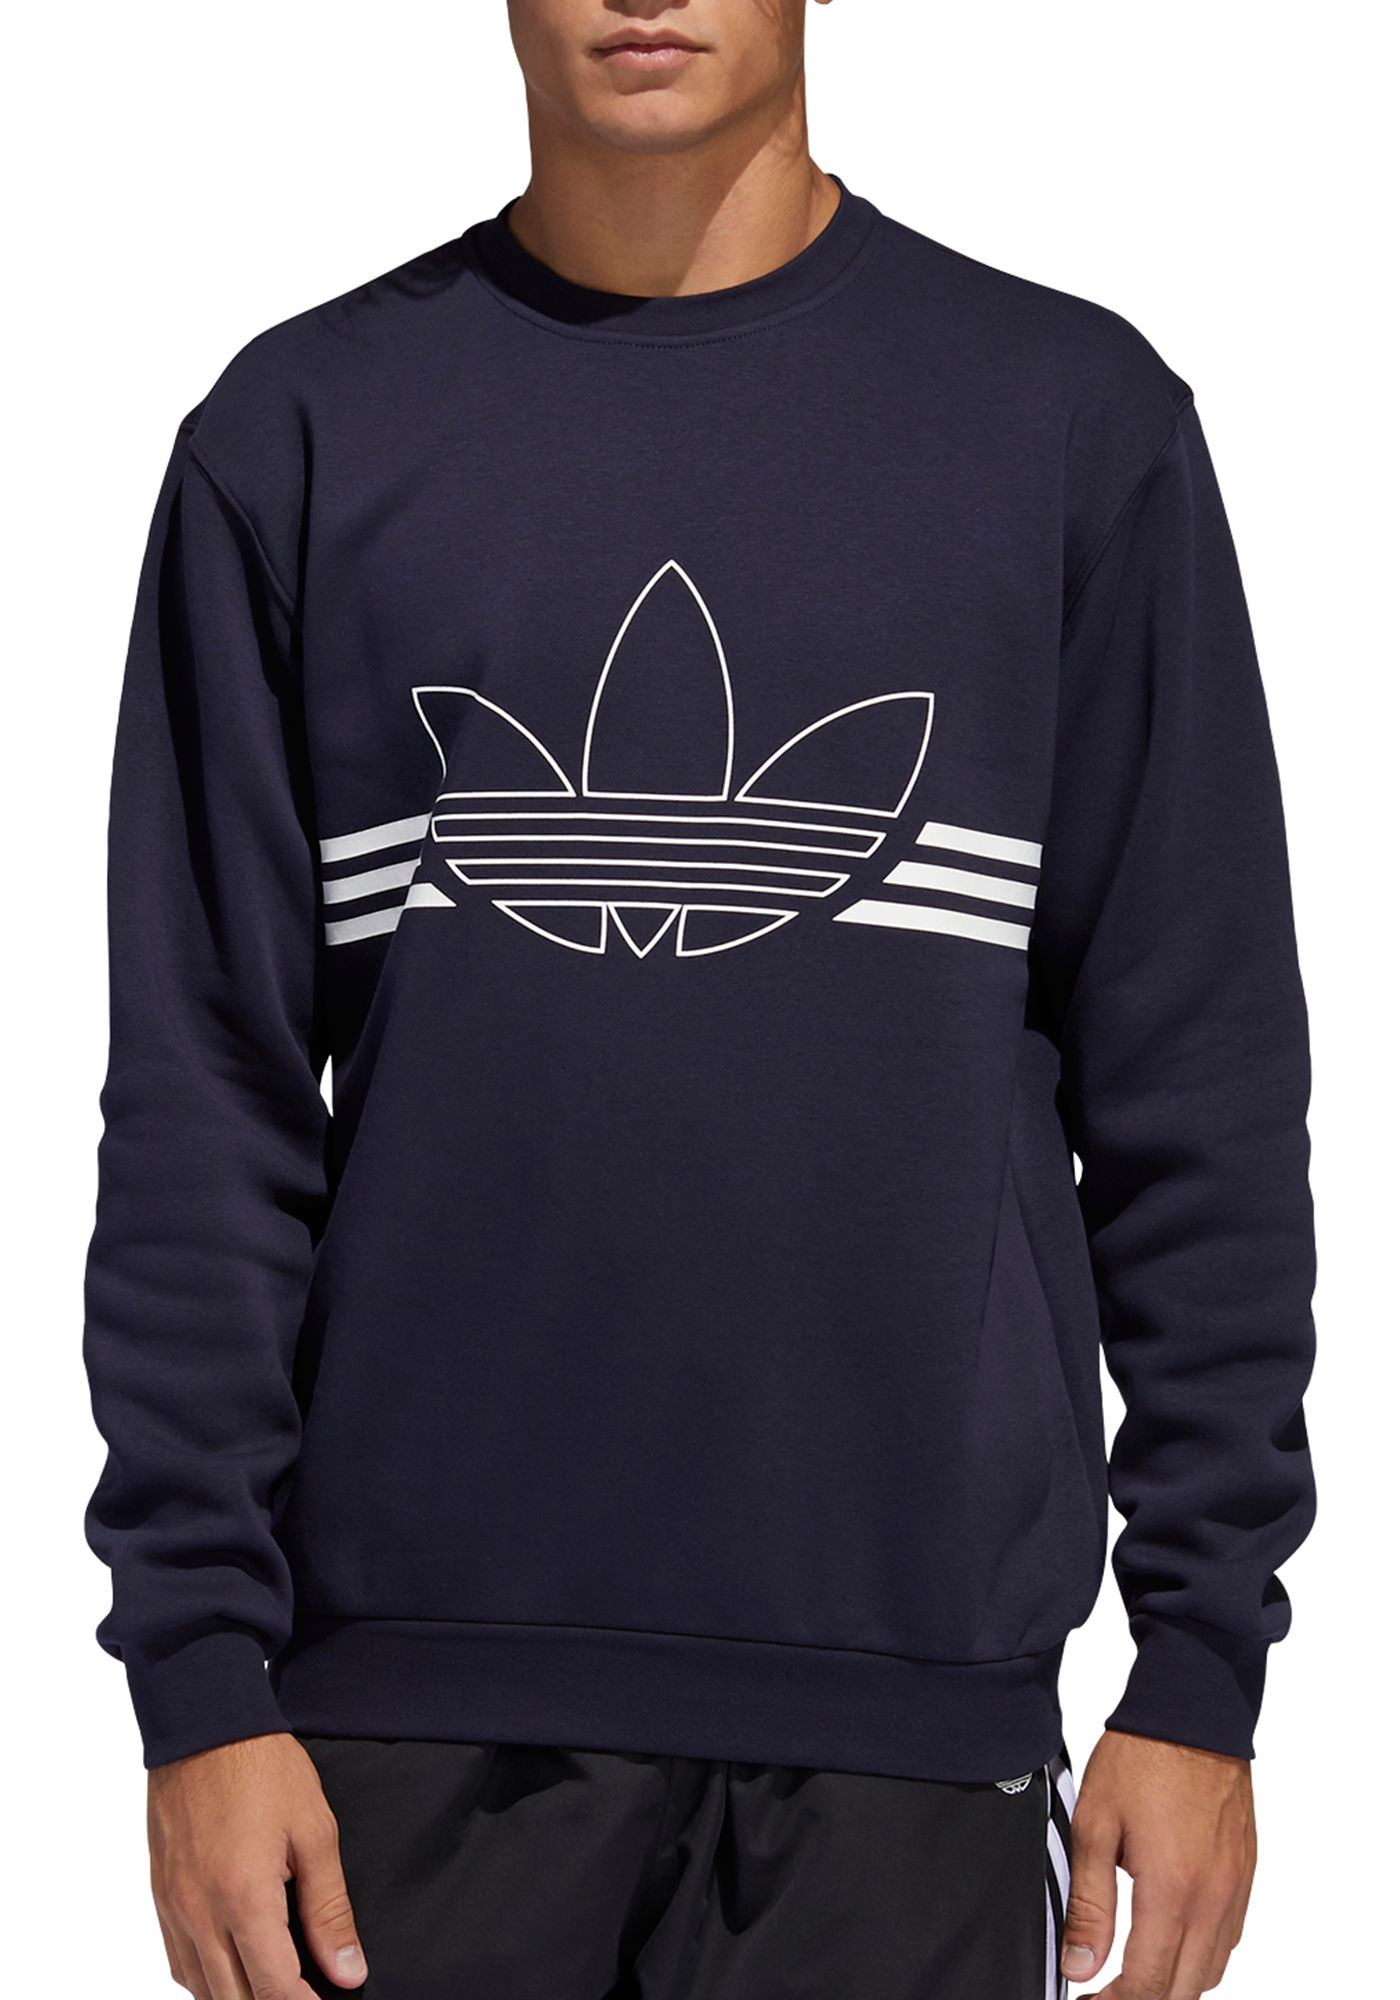 adidas Originals Men's Outline Crewneck Sweatshirt